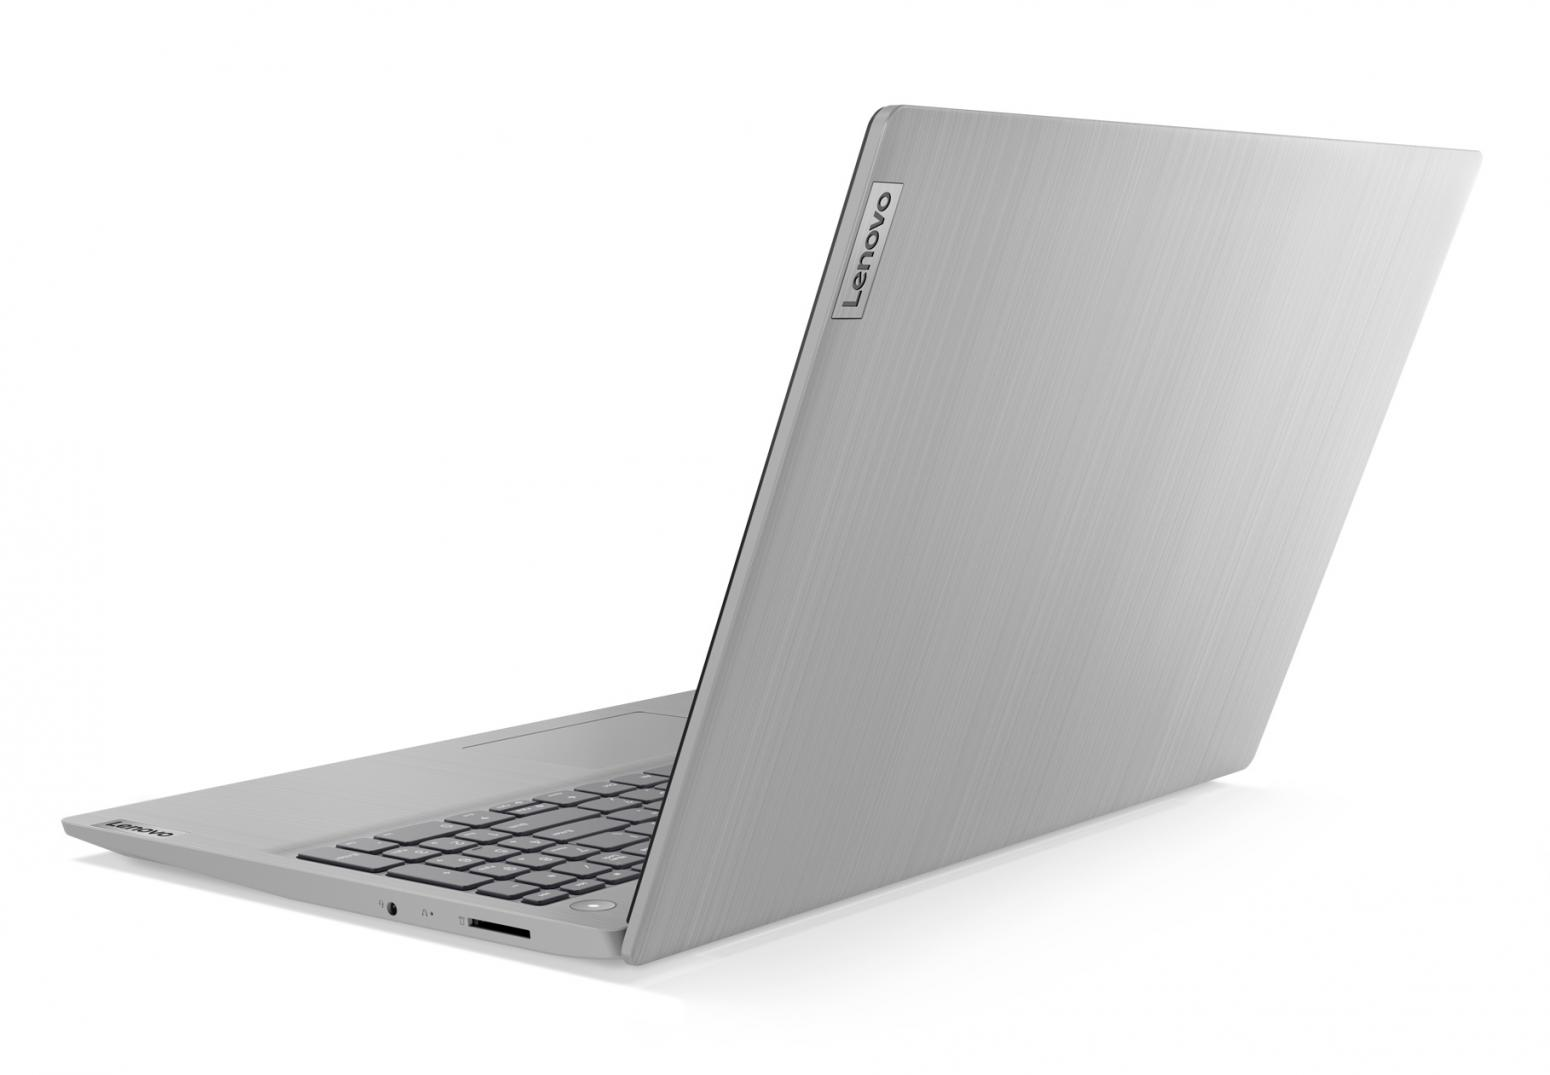 Ordinateur portable Lenovo IdeaPad 3 15ADA05 (81W10028FR) Argent - photo 9